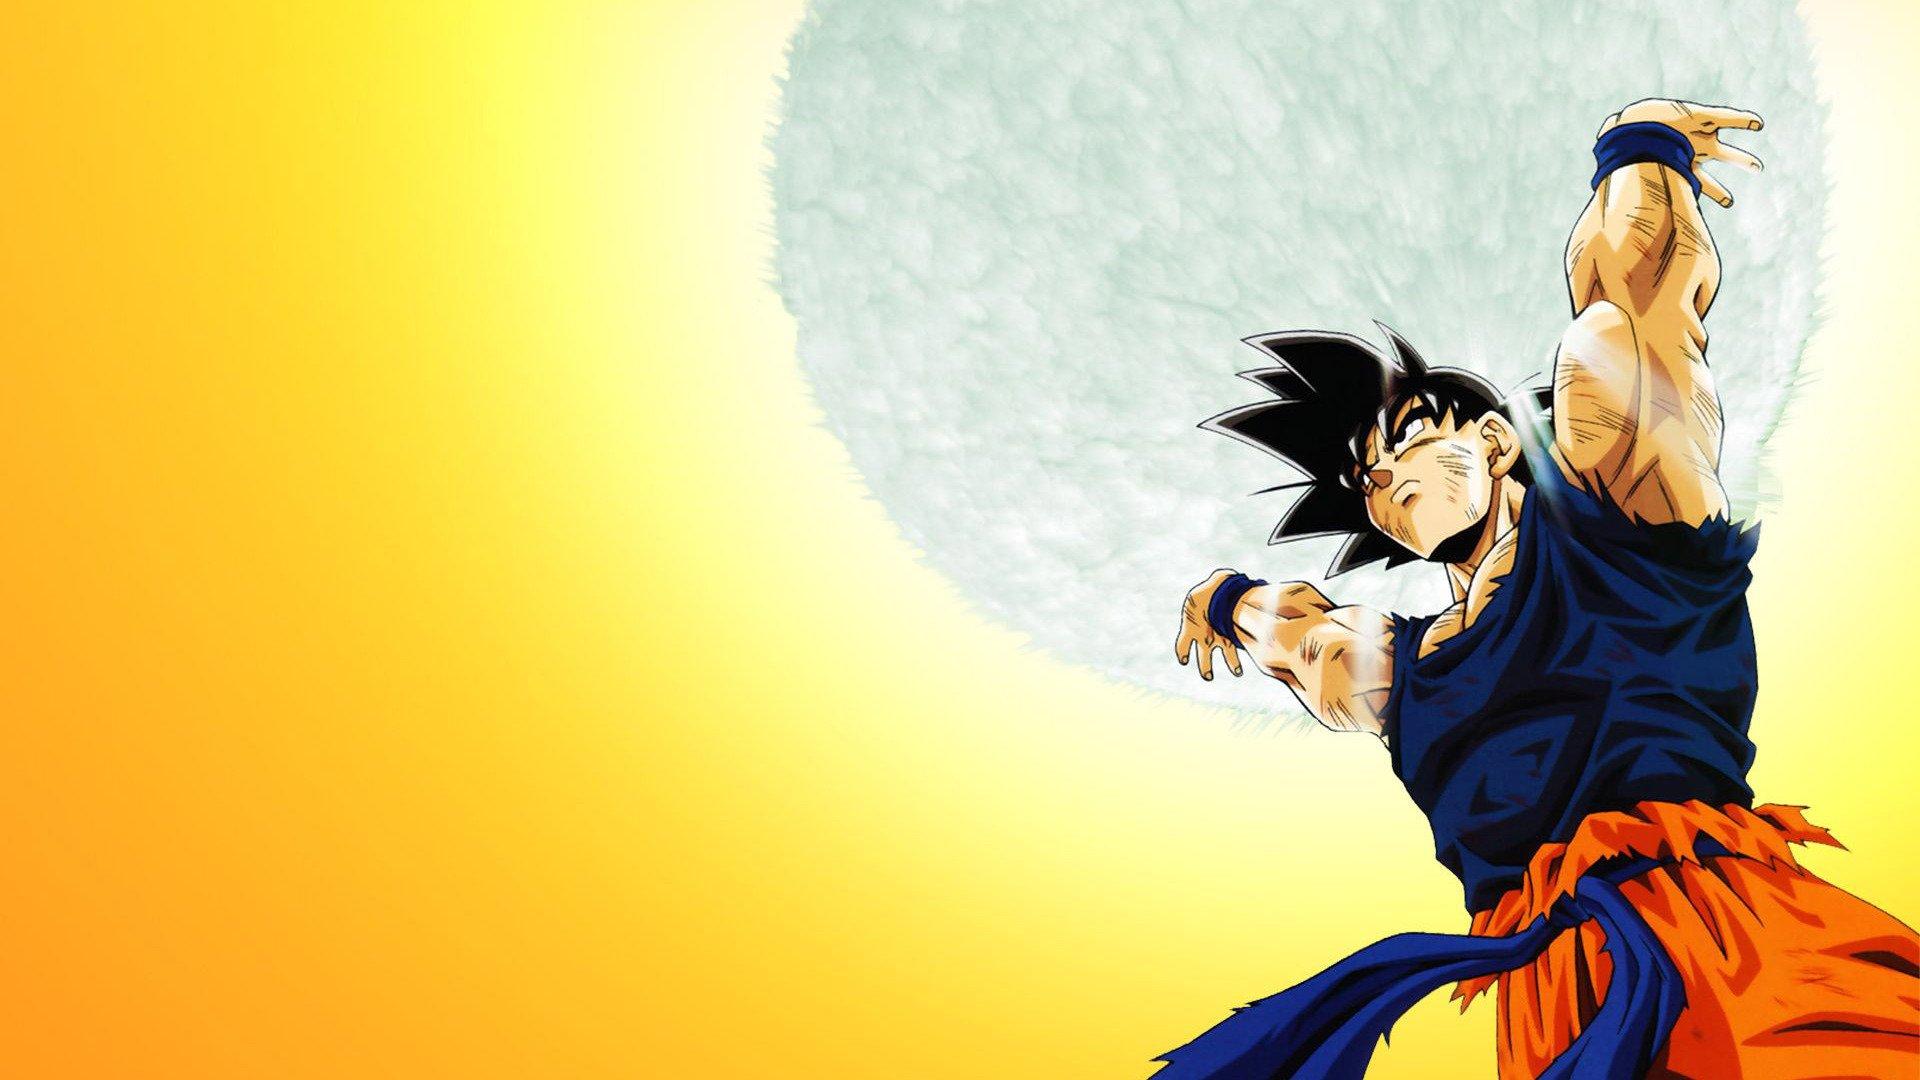 Dragon Ball Z Goku Wallpaper  WallpaperSafari